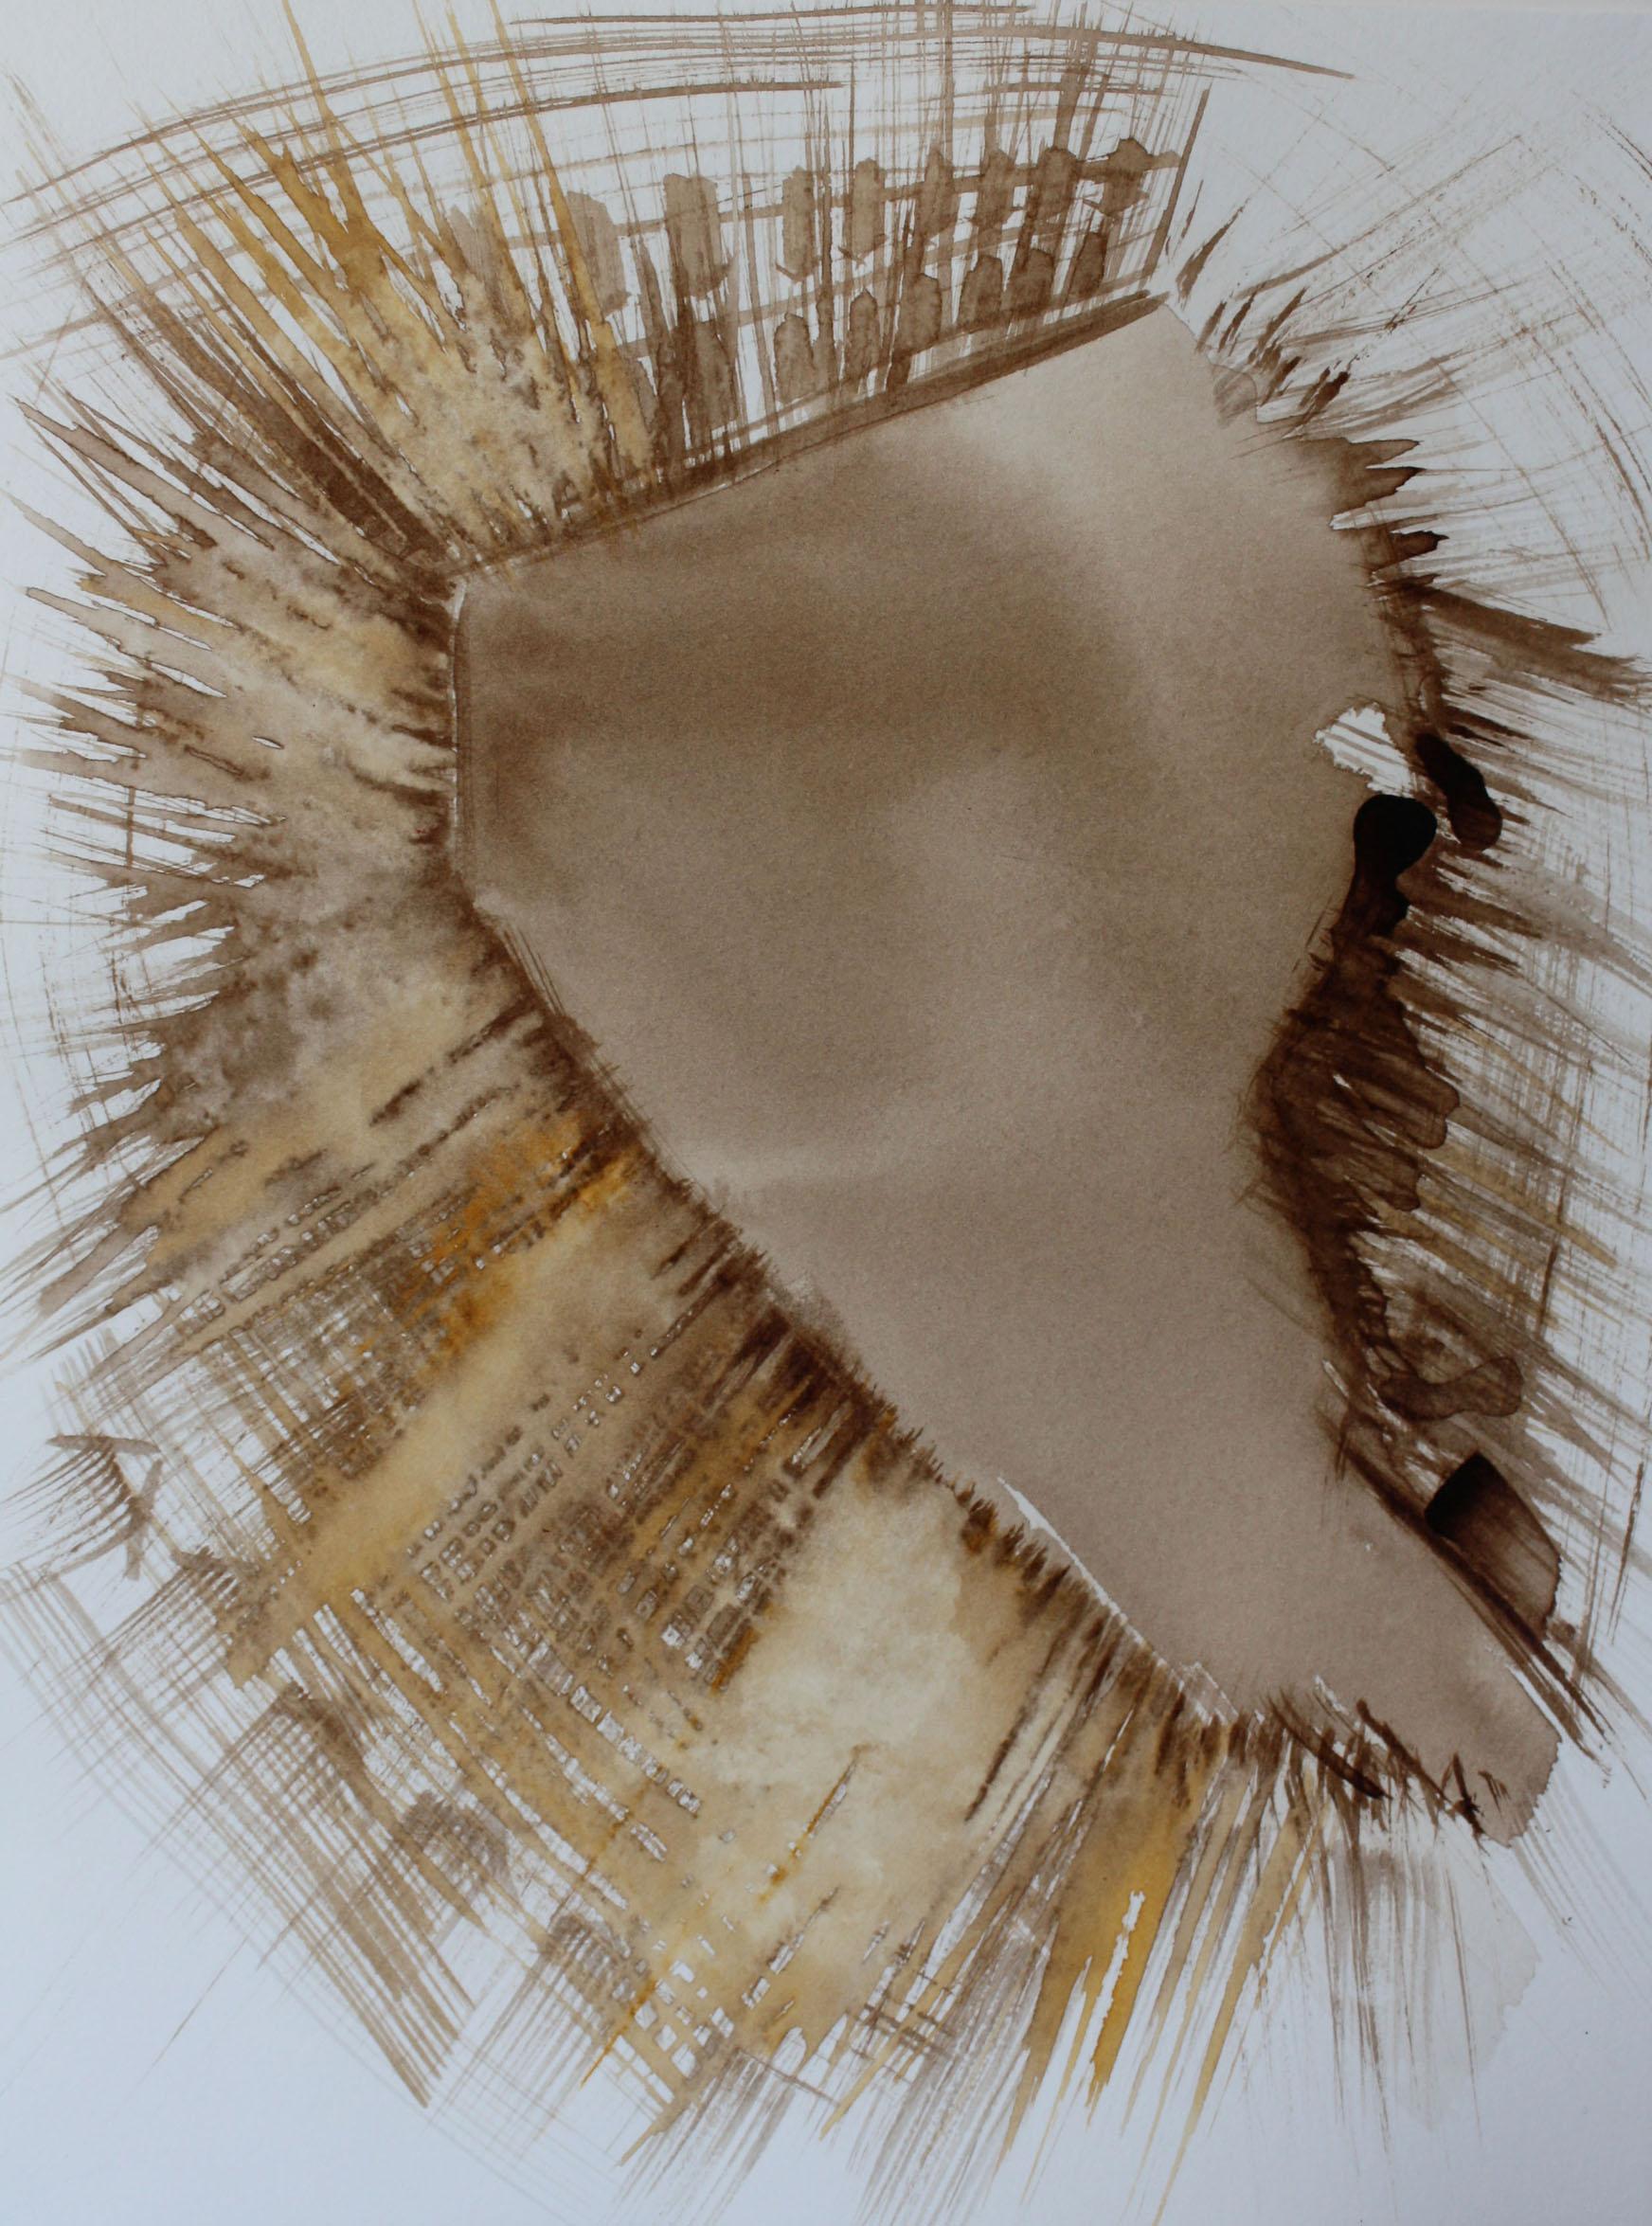 S.T,Trieste, 2010; bitume e china su carta, 23x30,5 cm.